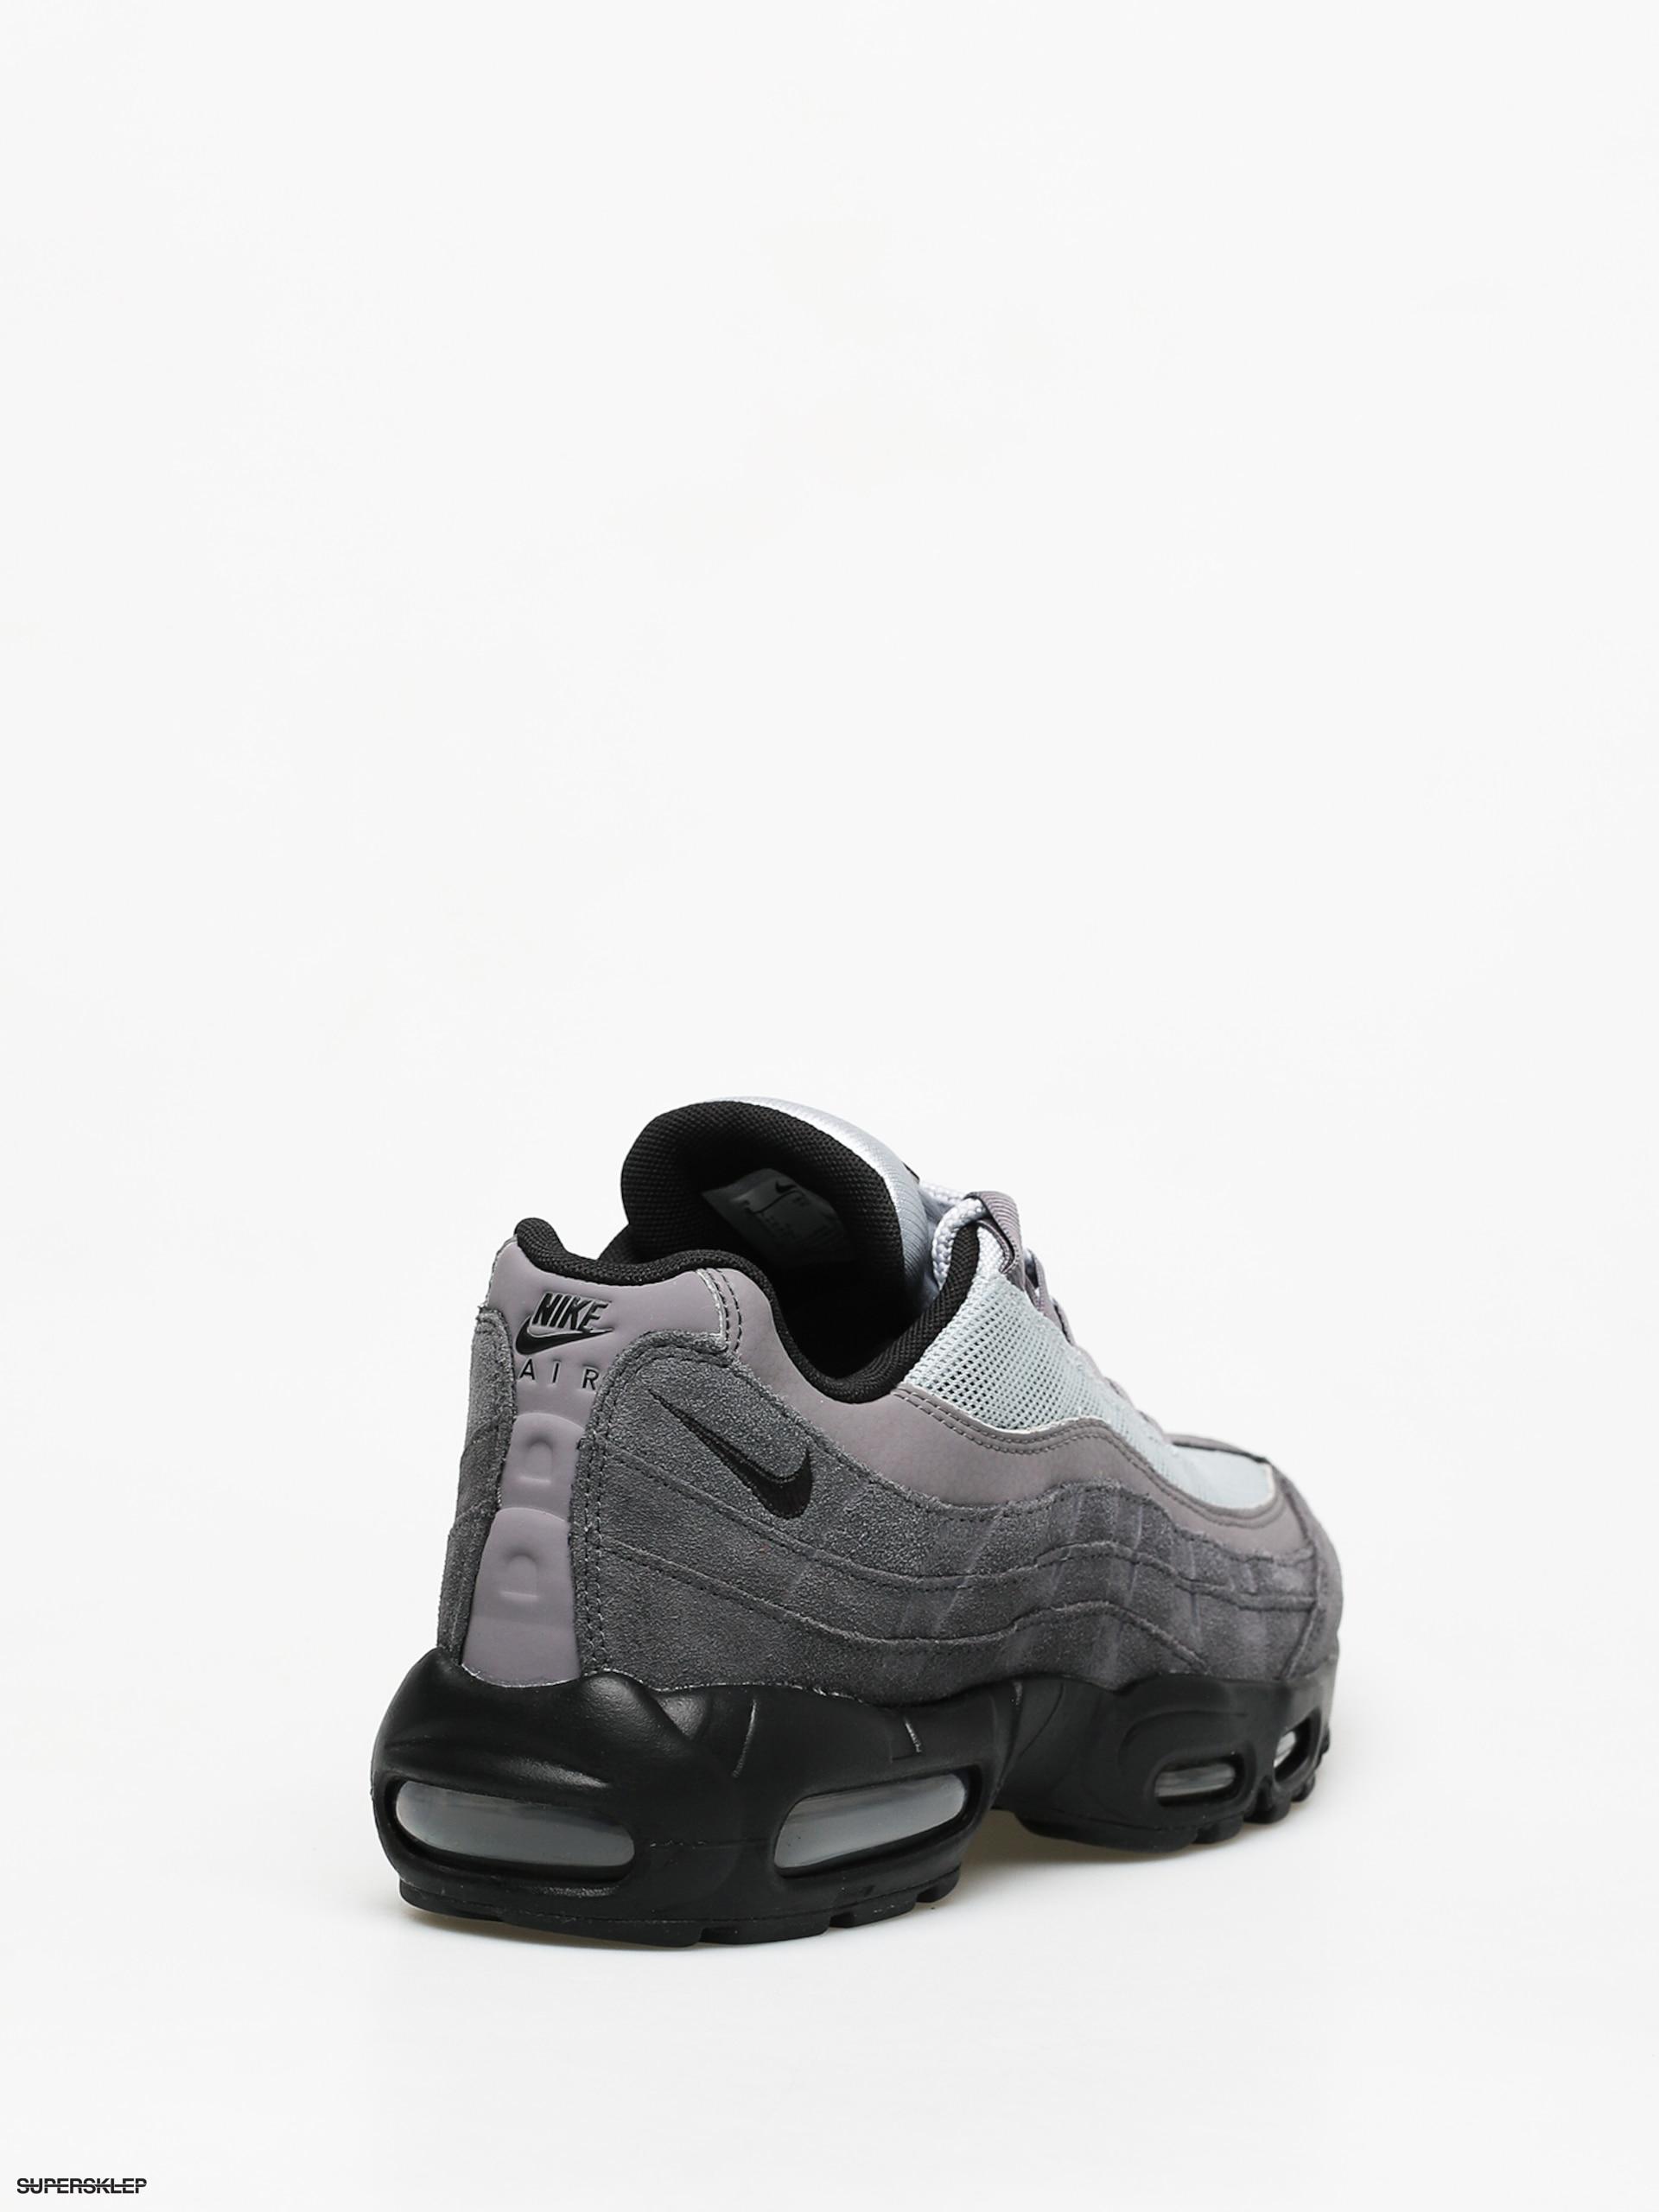 Buty Nike Air Max 90 Essential (blackblack wolf grey anthracite)